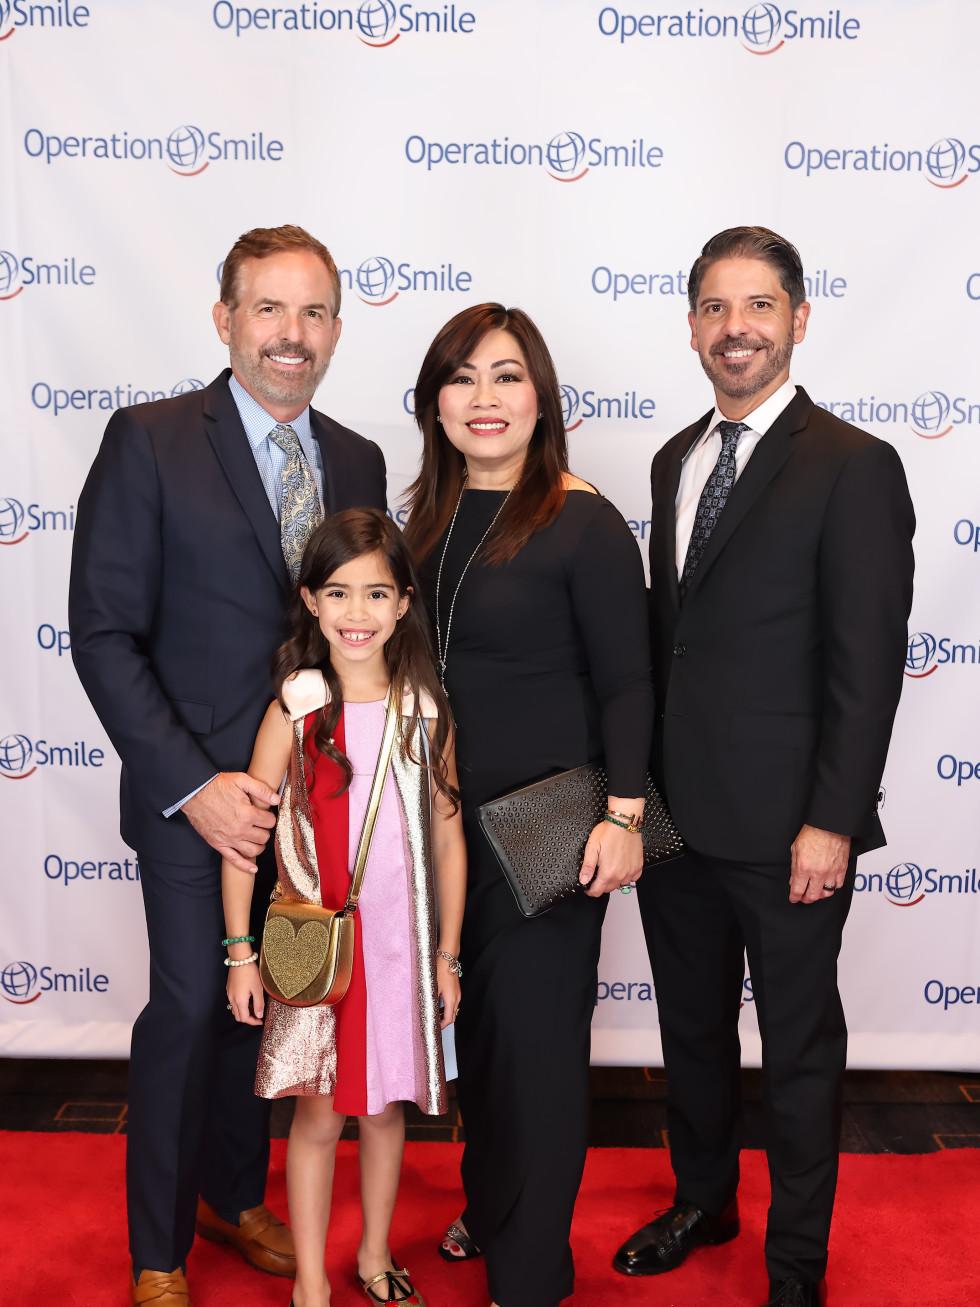 Operation Smile Gala 2021 Matt Holley Isabella Santini Hoang Dr, Dane Hoang Dr, Noel Santini